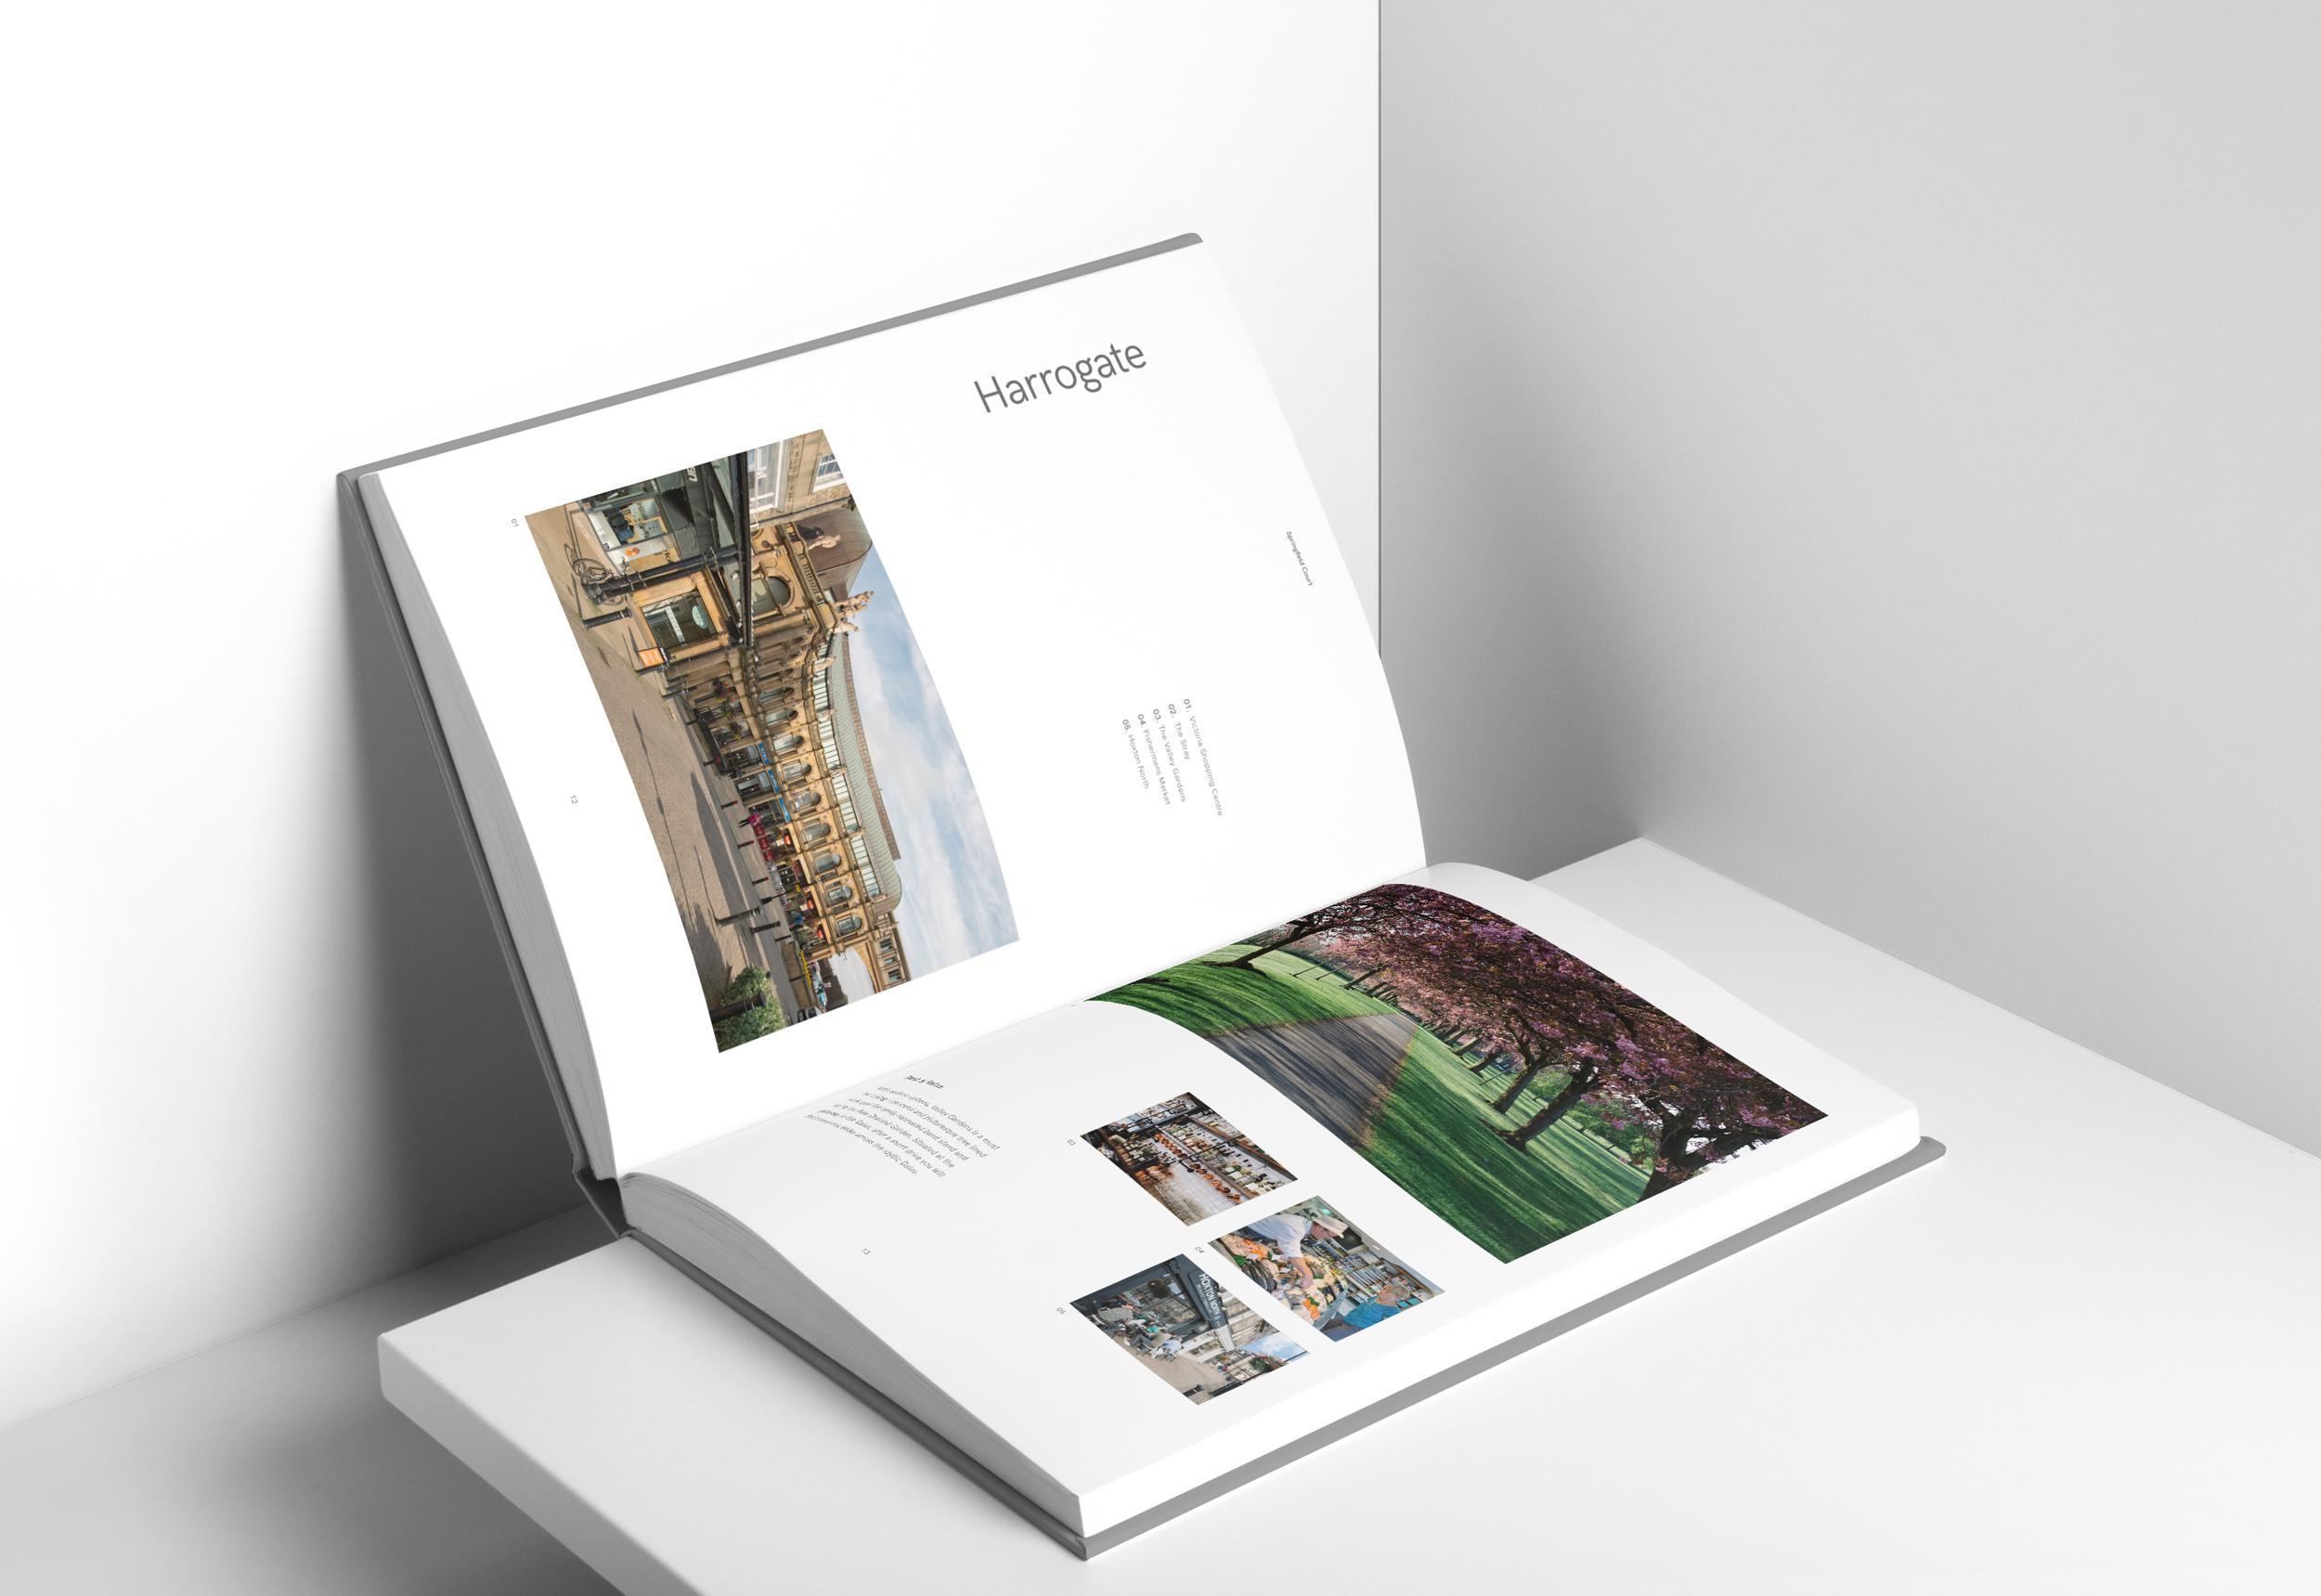 11-hardcover-open-book-1